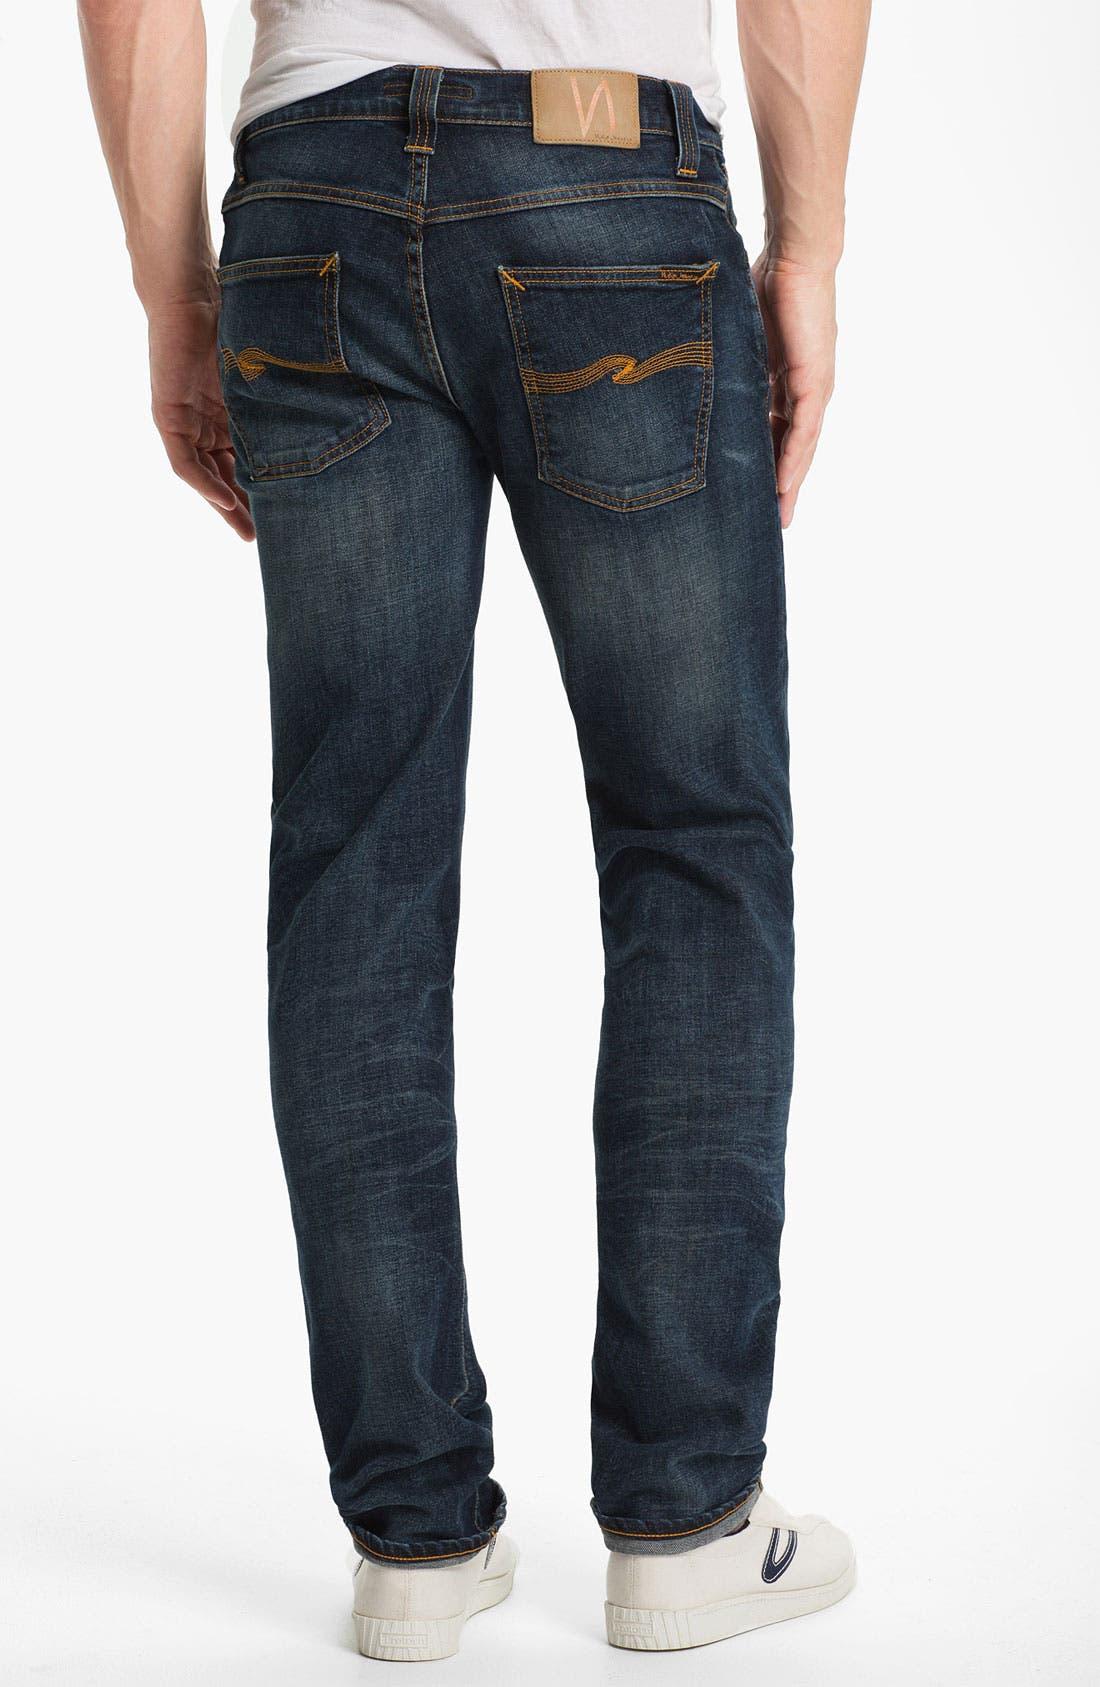 Alternate Image 1 Selected - Nudie 'Grim Tim' Skinny Straight Leg Jeans (Organic Crushed Denim)